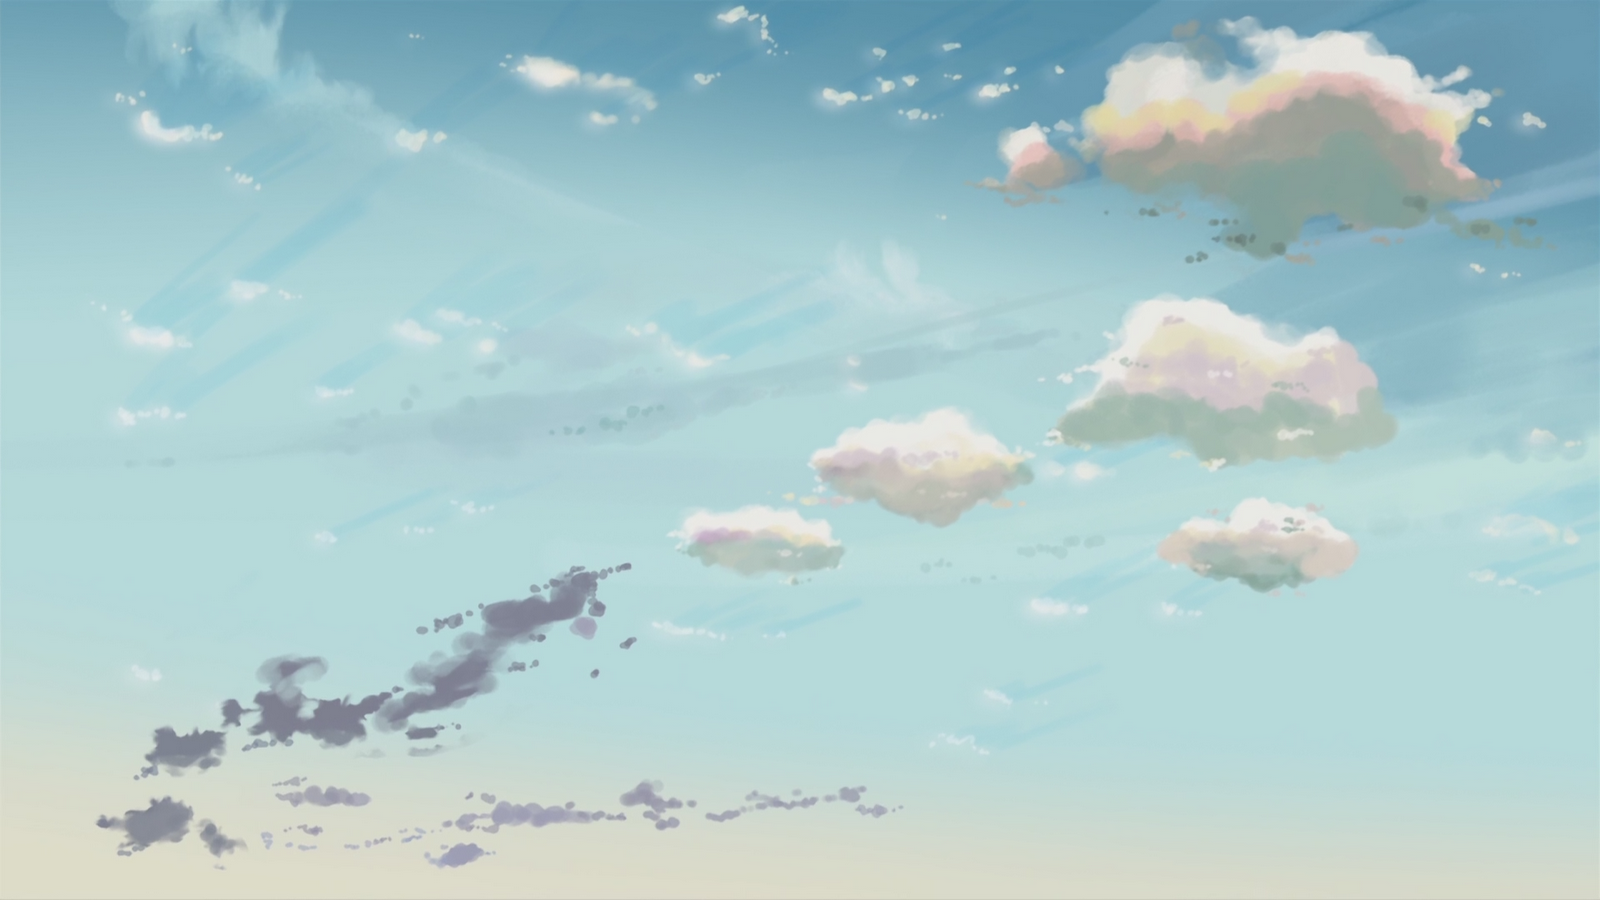 Wallpaper depot 10 beautiful anime scenery wallpapers - Anime scenery wallpaper laptop ...